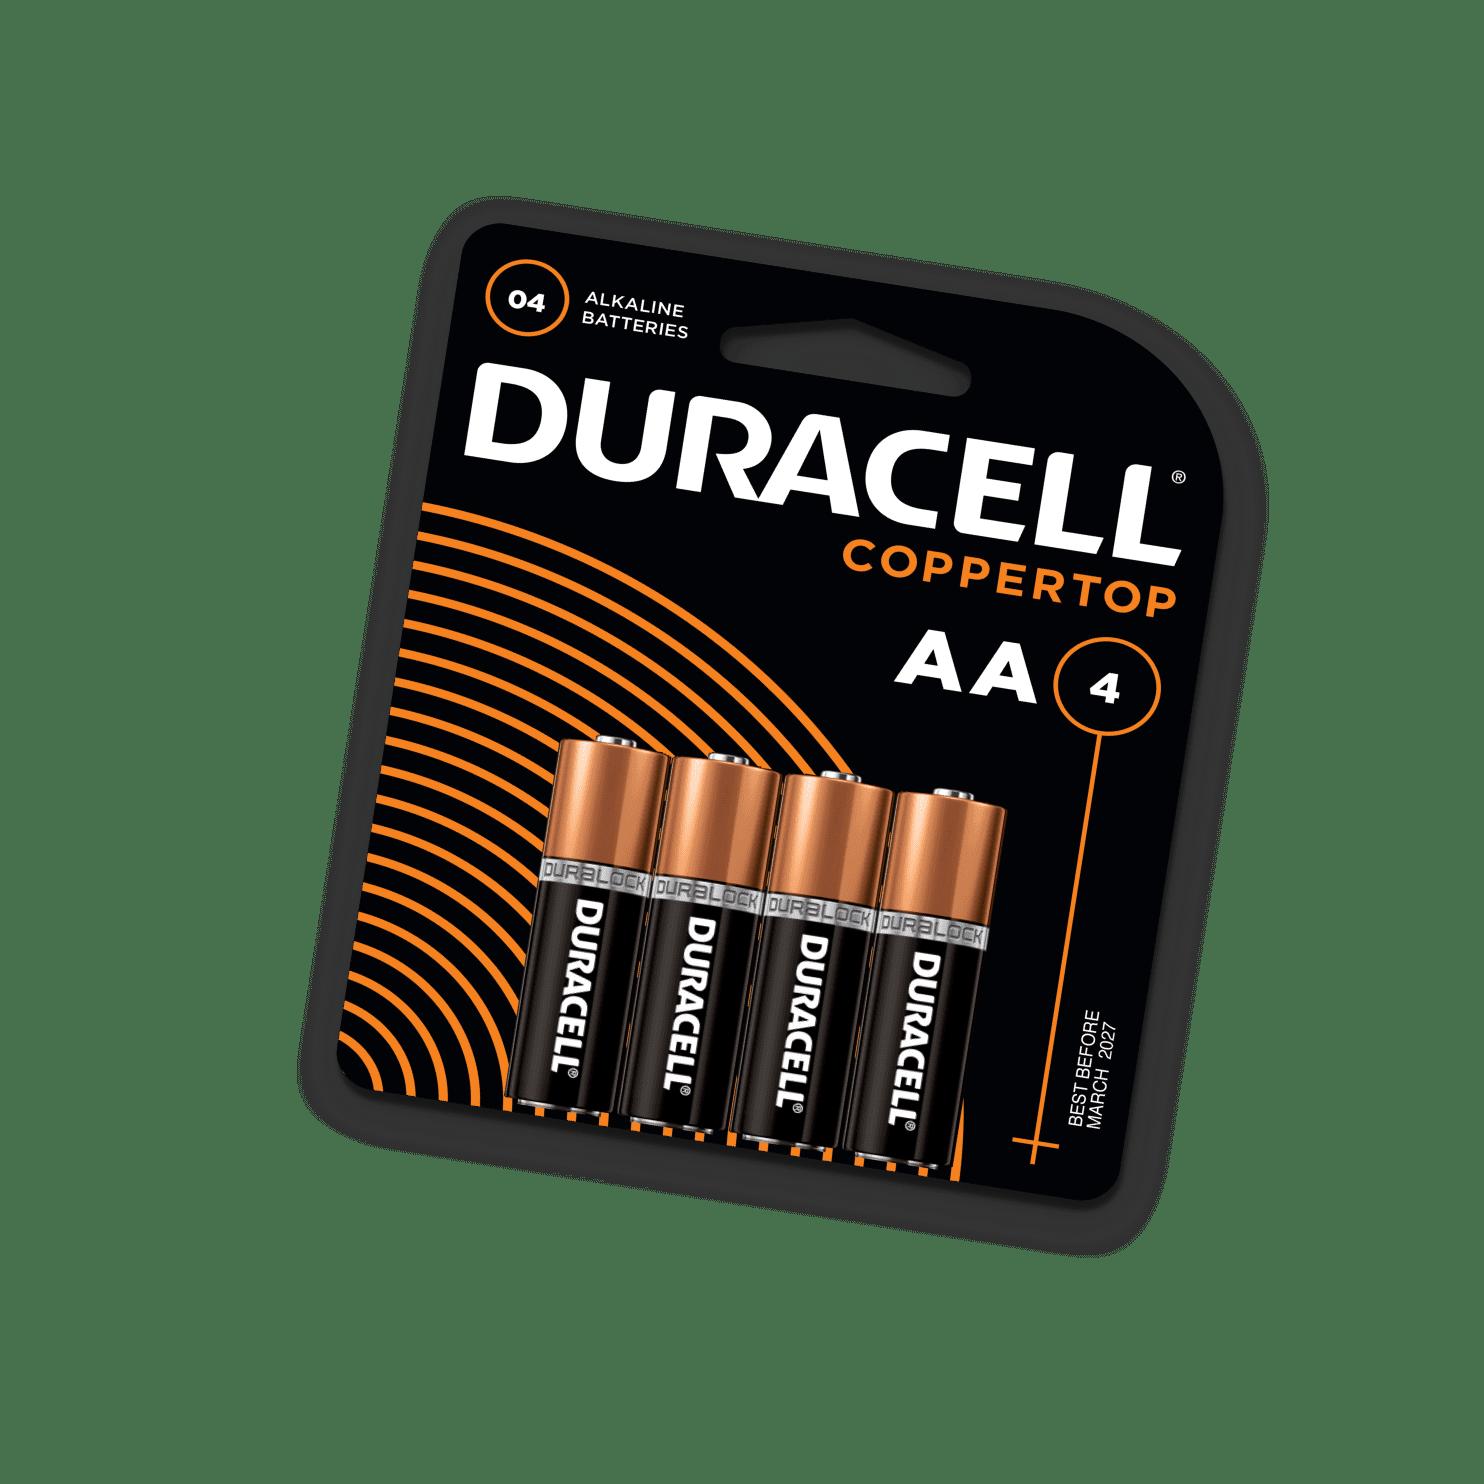 Duracell Packaging Design